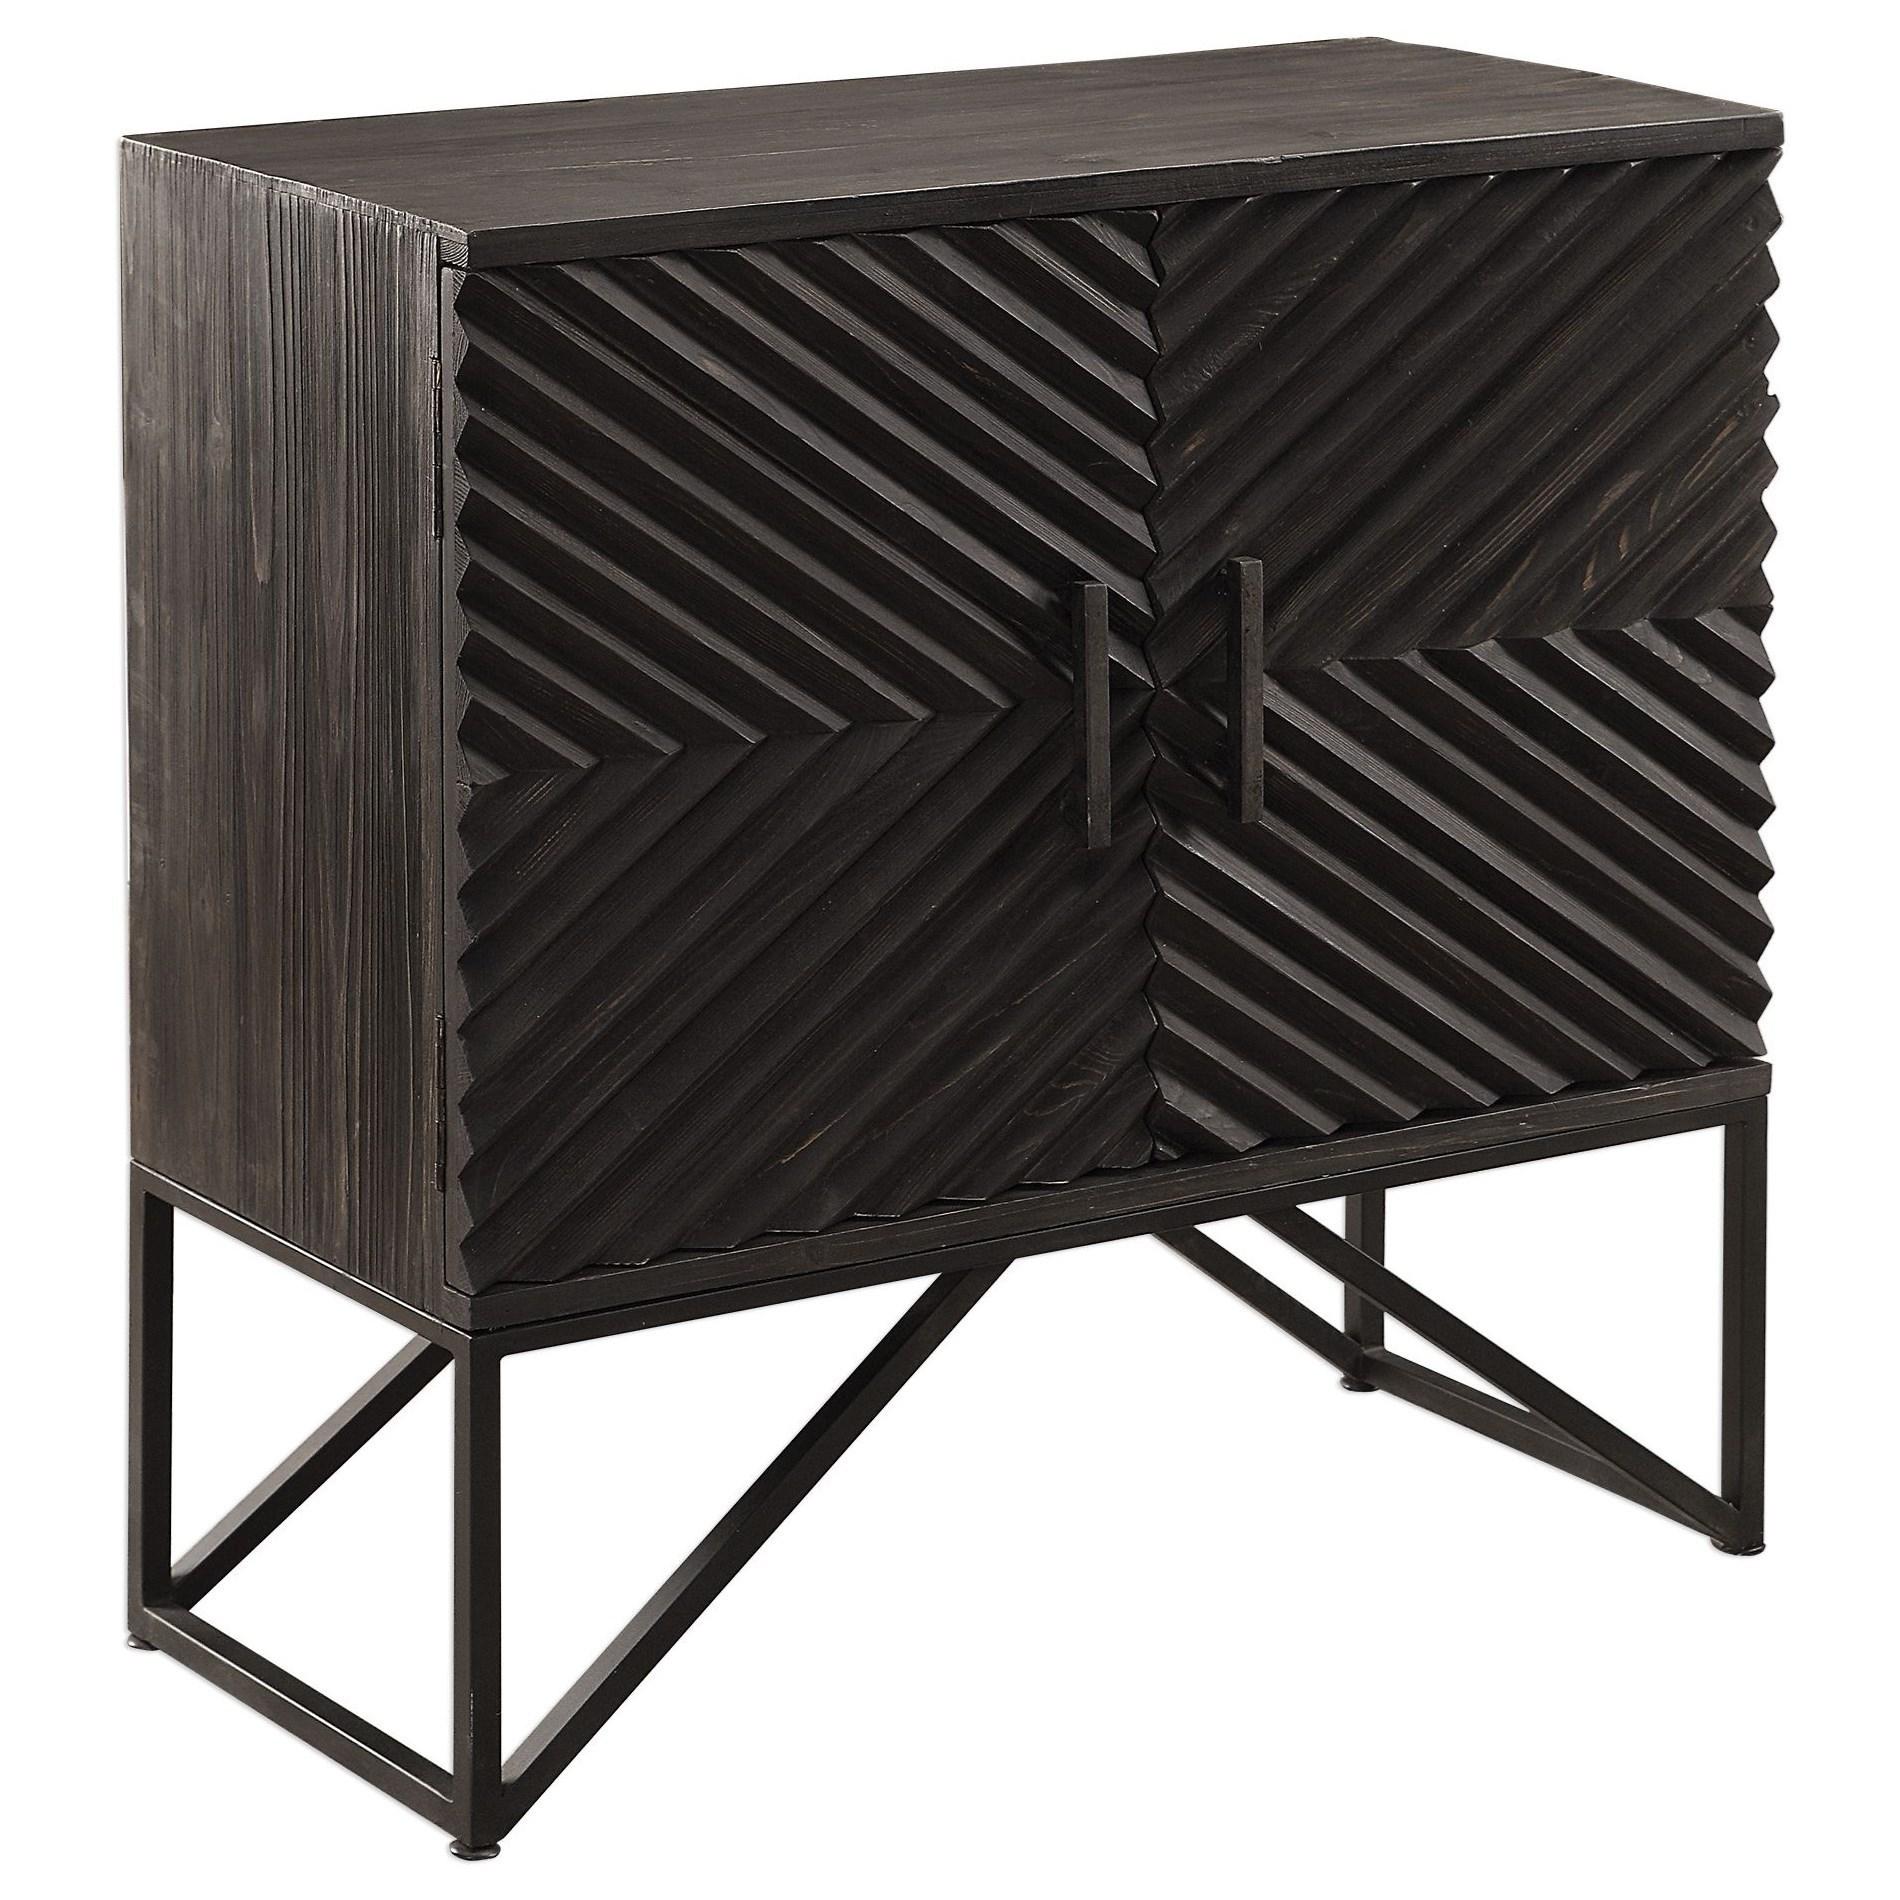 Accent Furniture - Chests Uttermost Zadie Ebony Accent Cabinet by Uttermost at Mueller Furniture